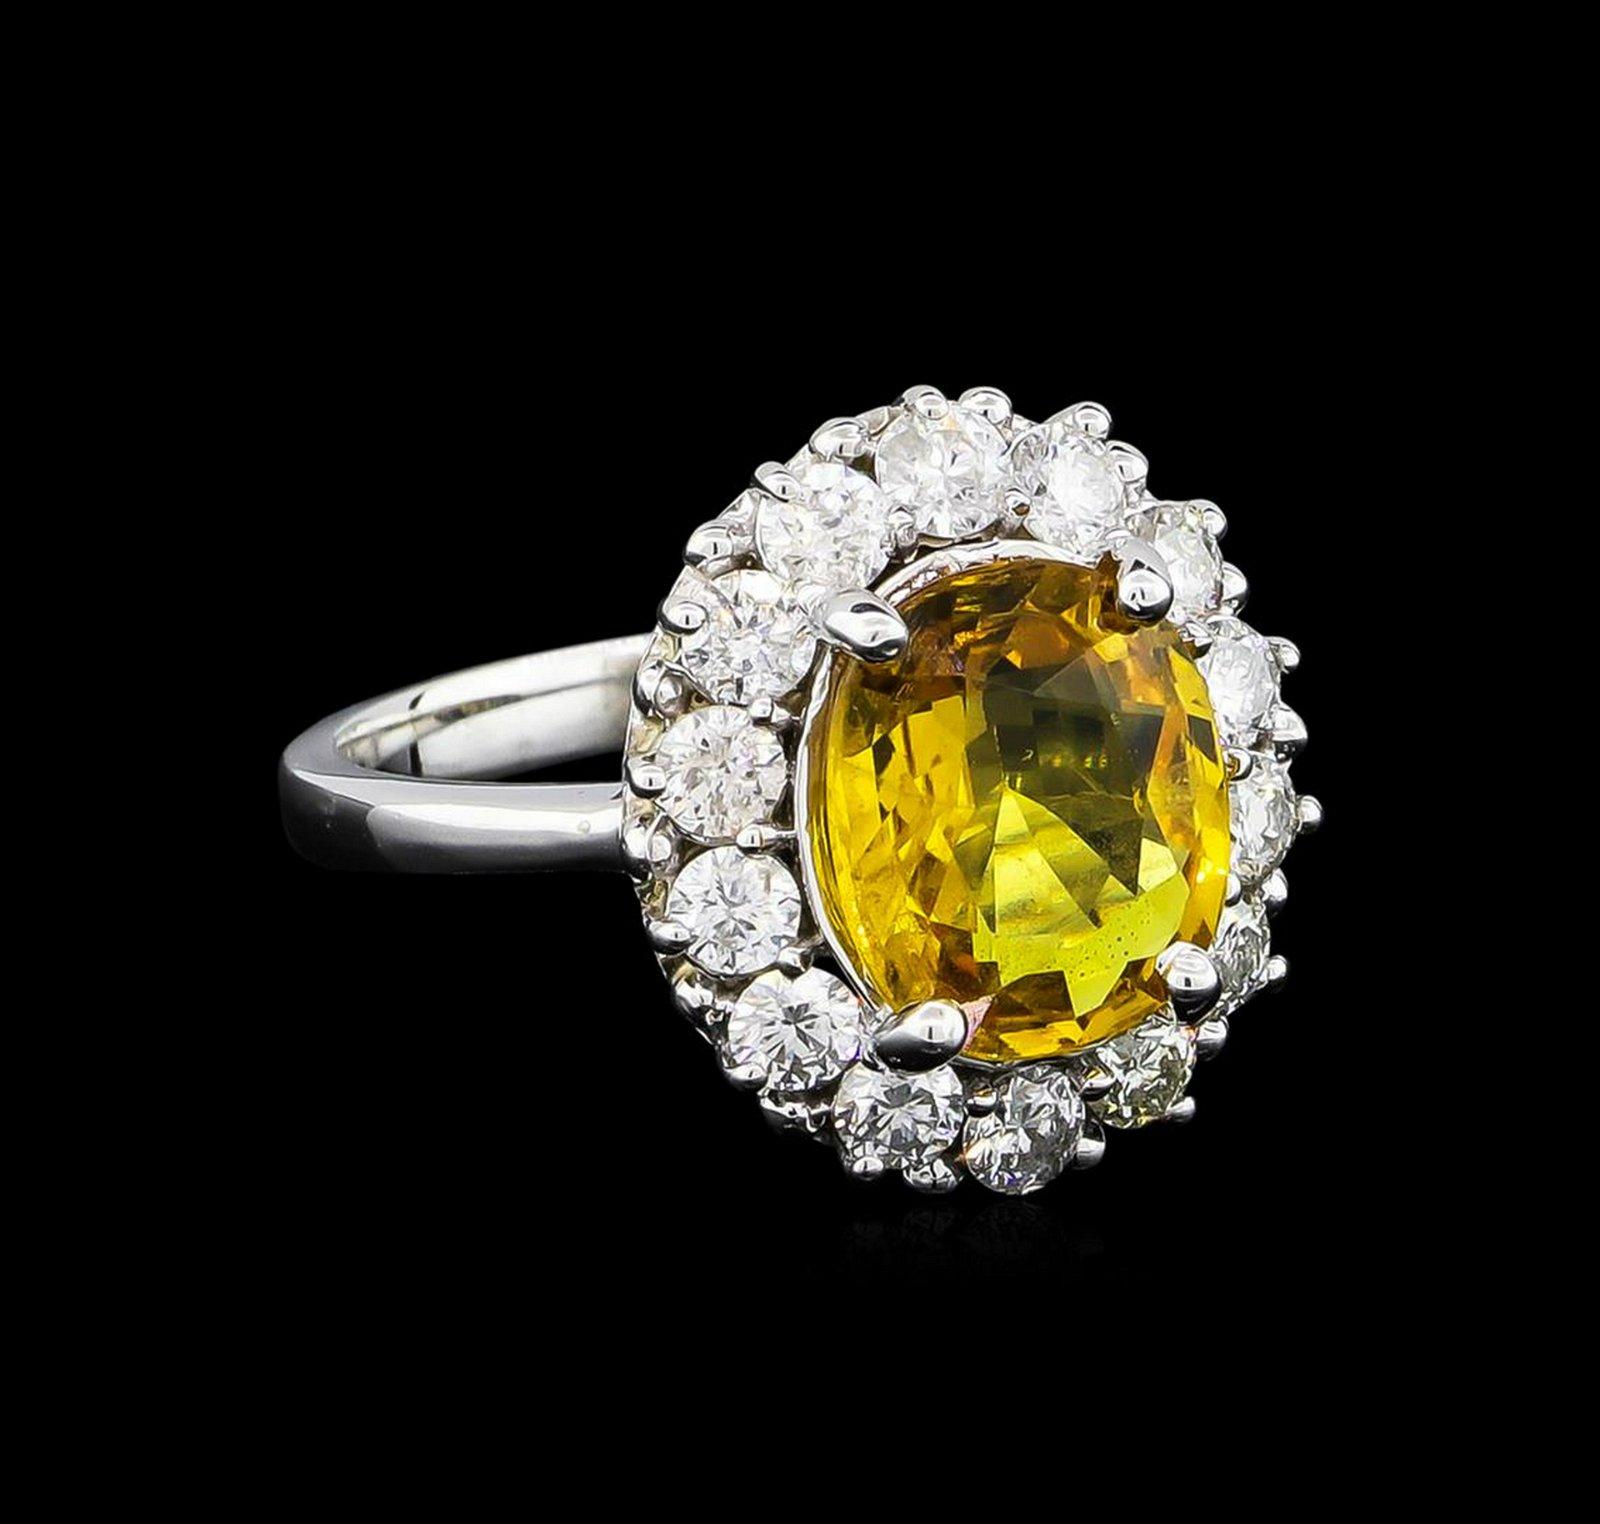 3.40 ctw Yellow Sapphire and Diamond Ring - 14KT White